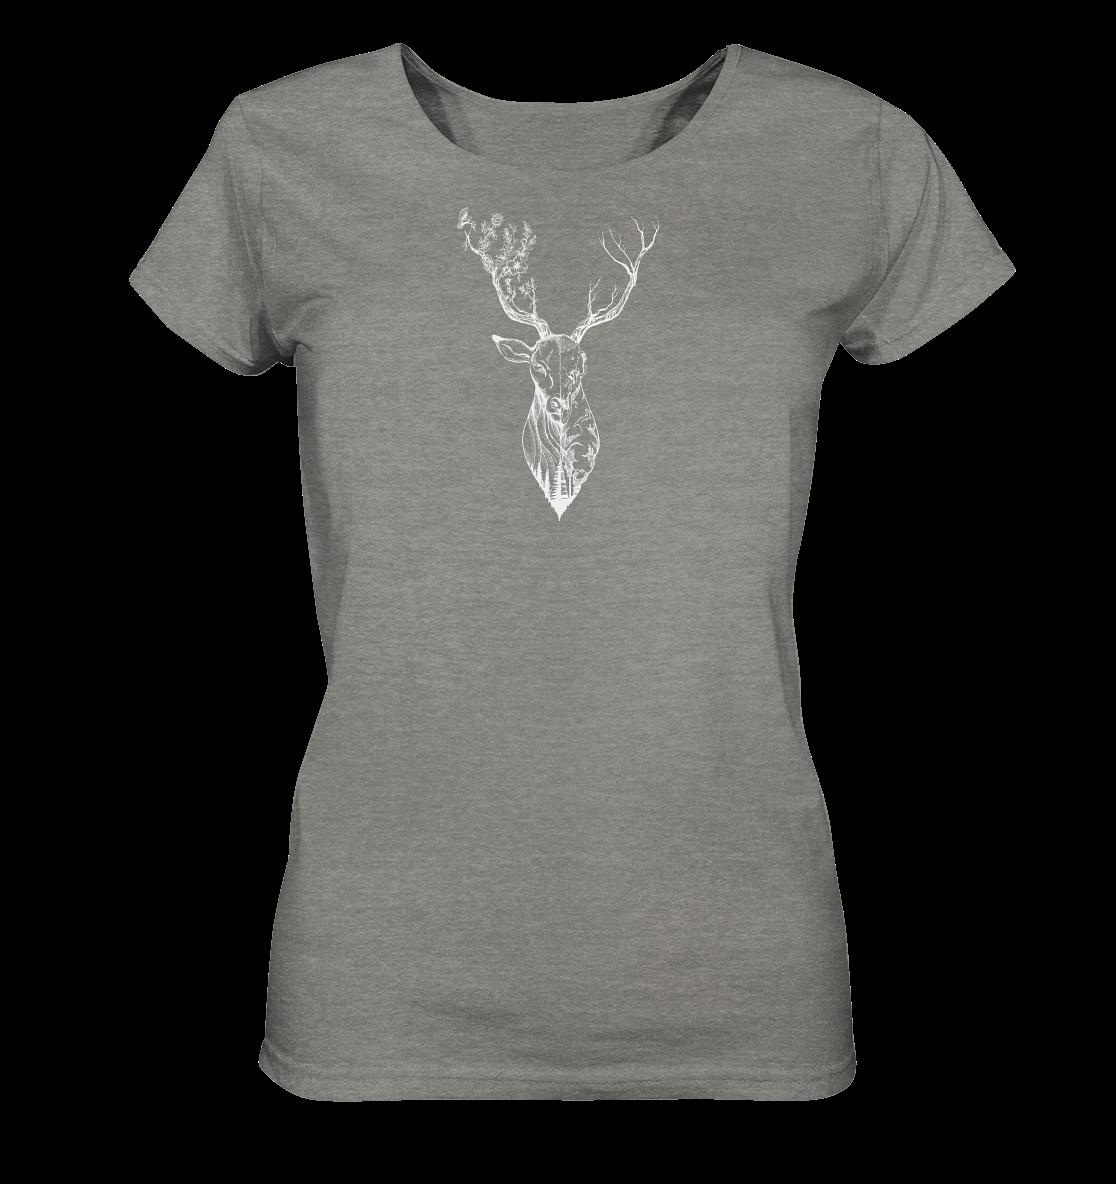 front-ladies-organic-shirt-meliert-818381-1116x-8.png